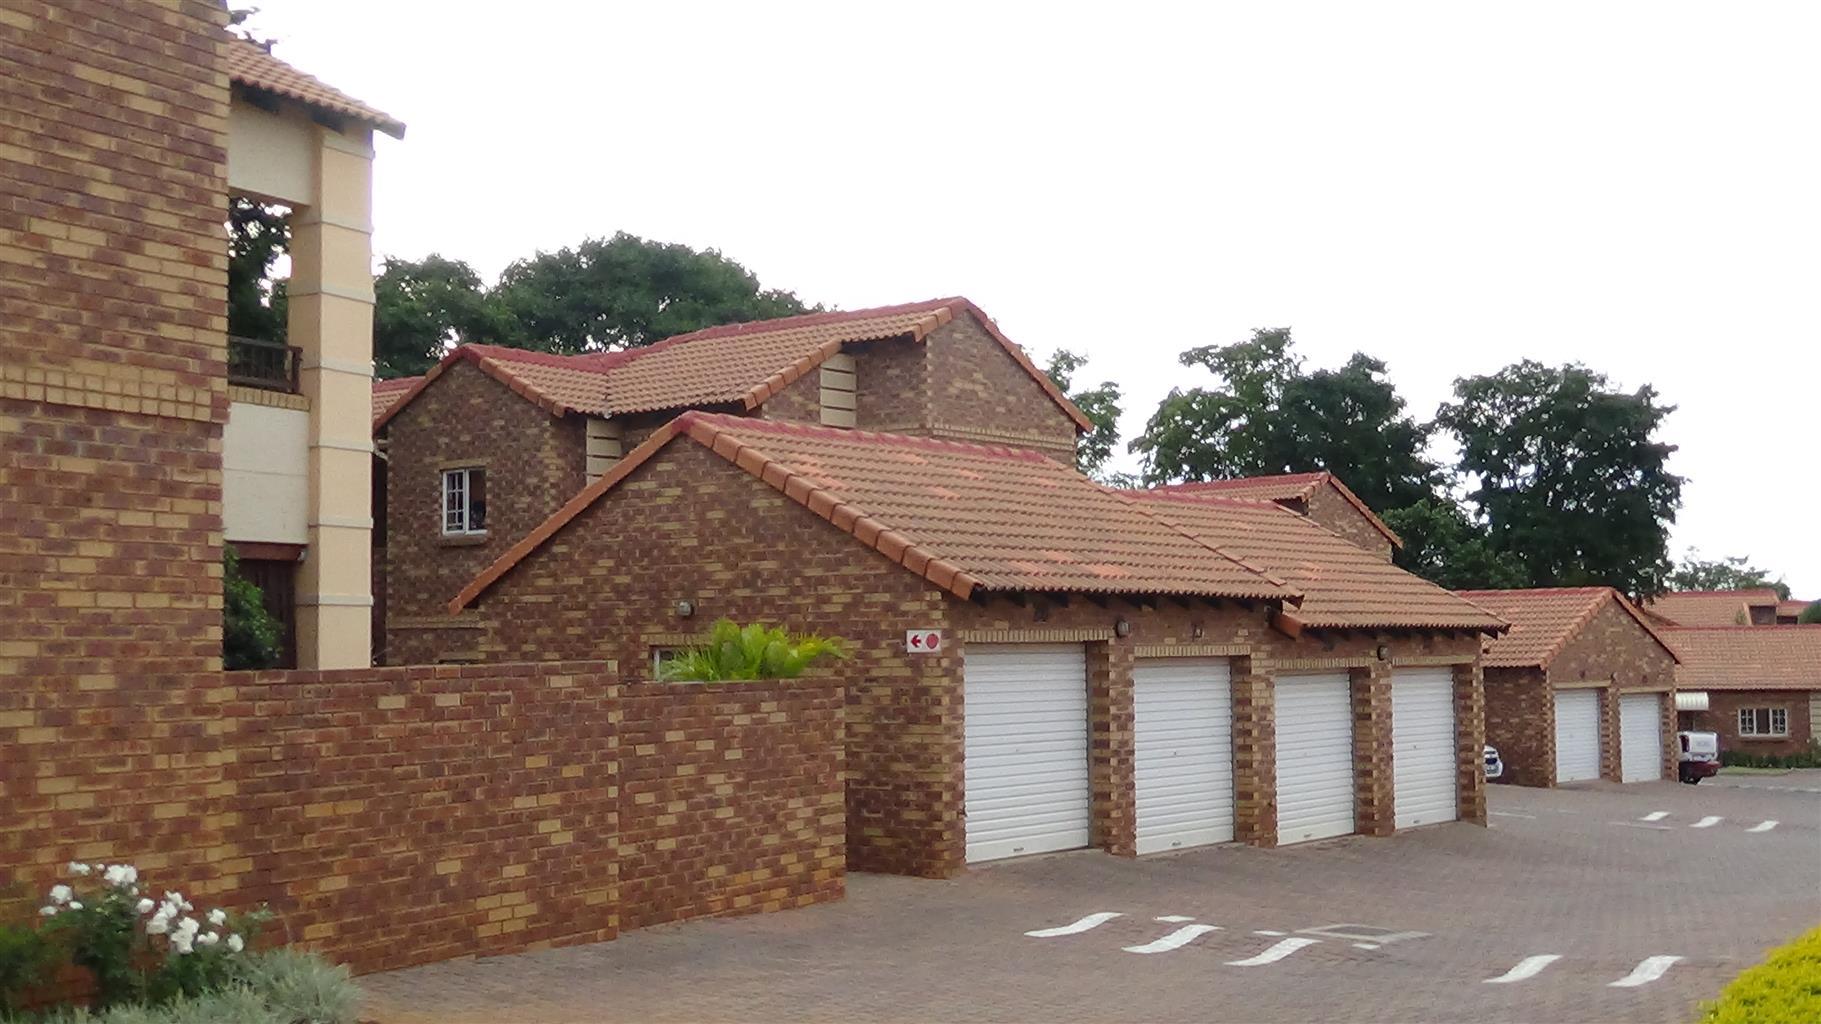 3 Bedroom Townhouse Apartment - Equestria (PTA EAST) – R 1 100 000